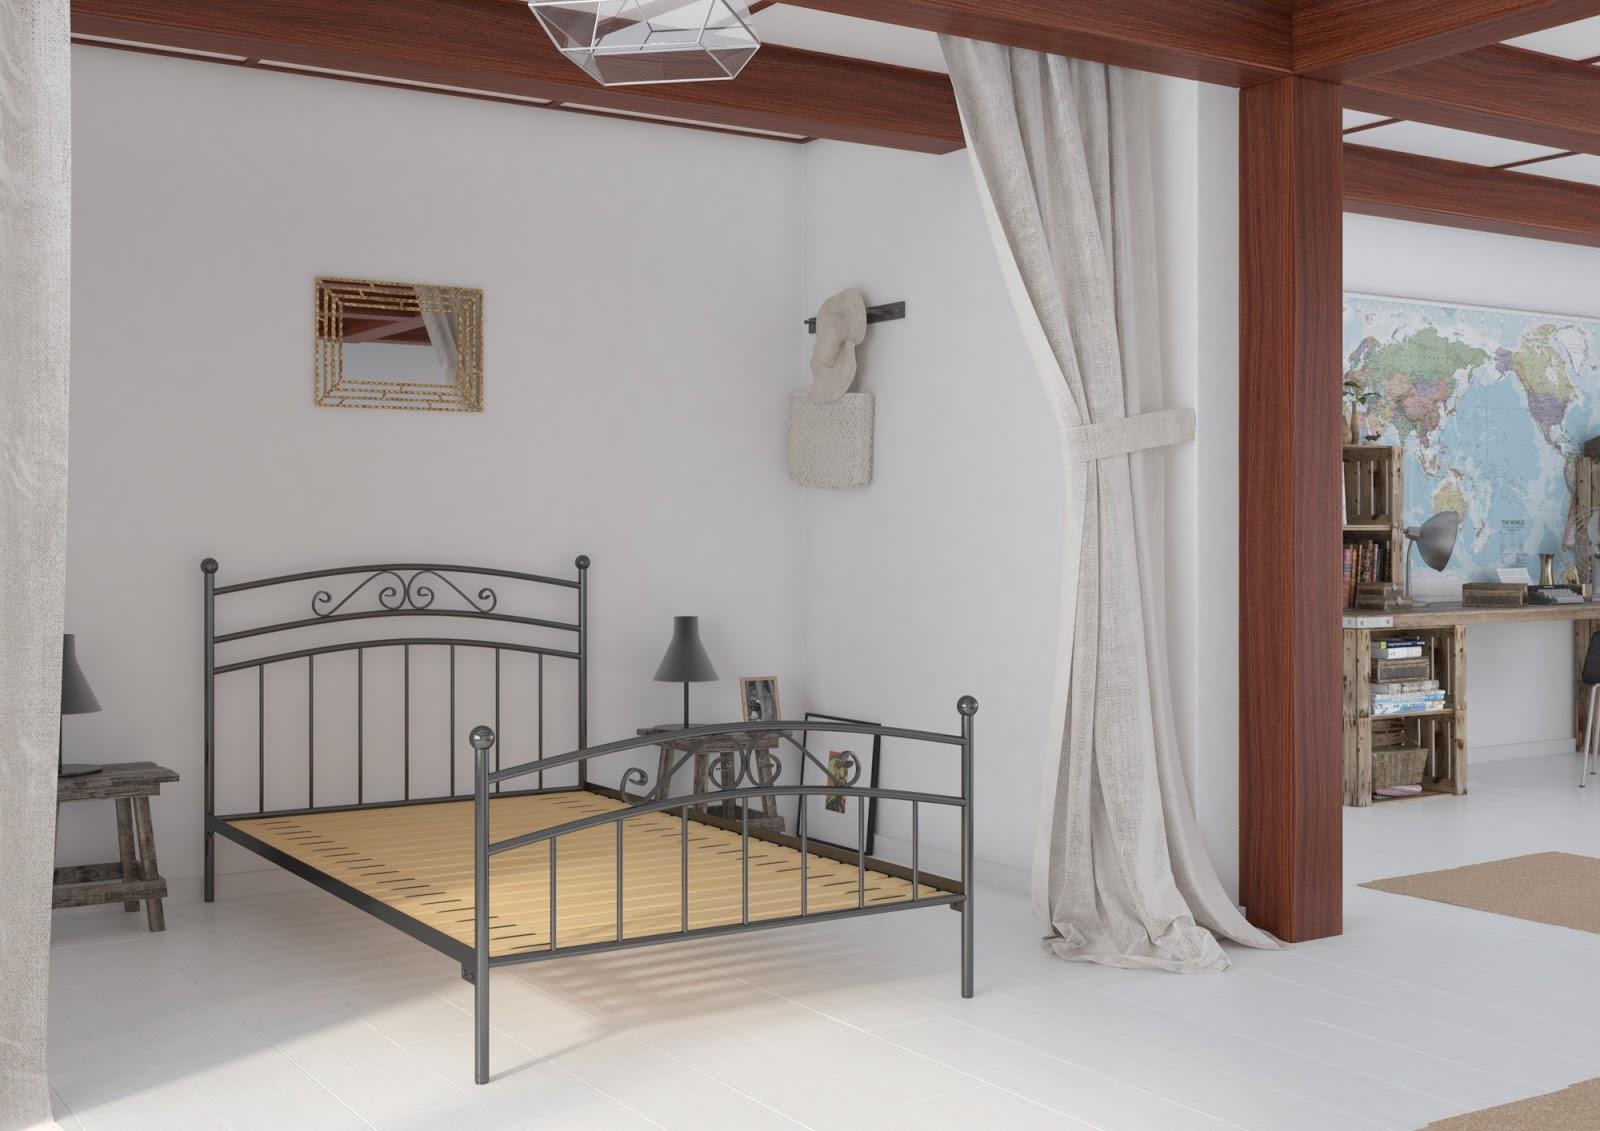 Łóżko metalowe wzór 36